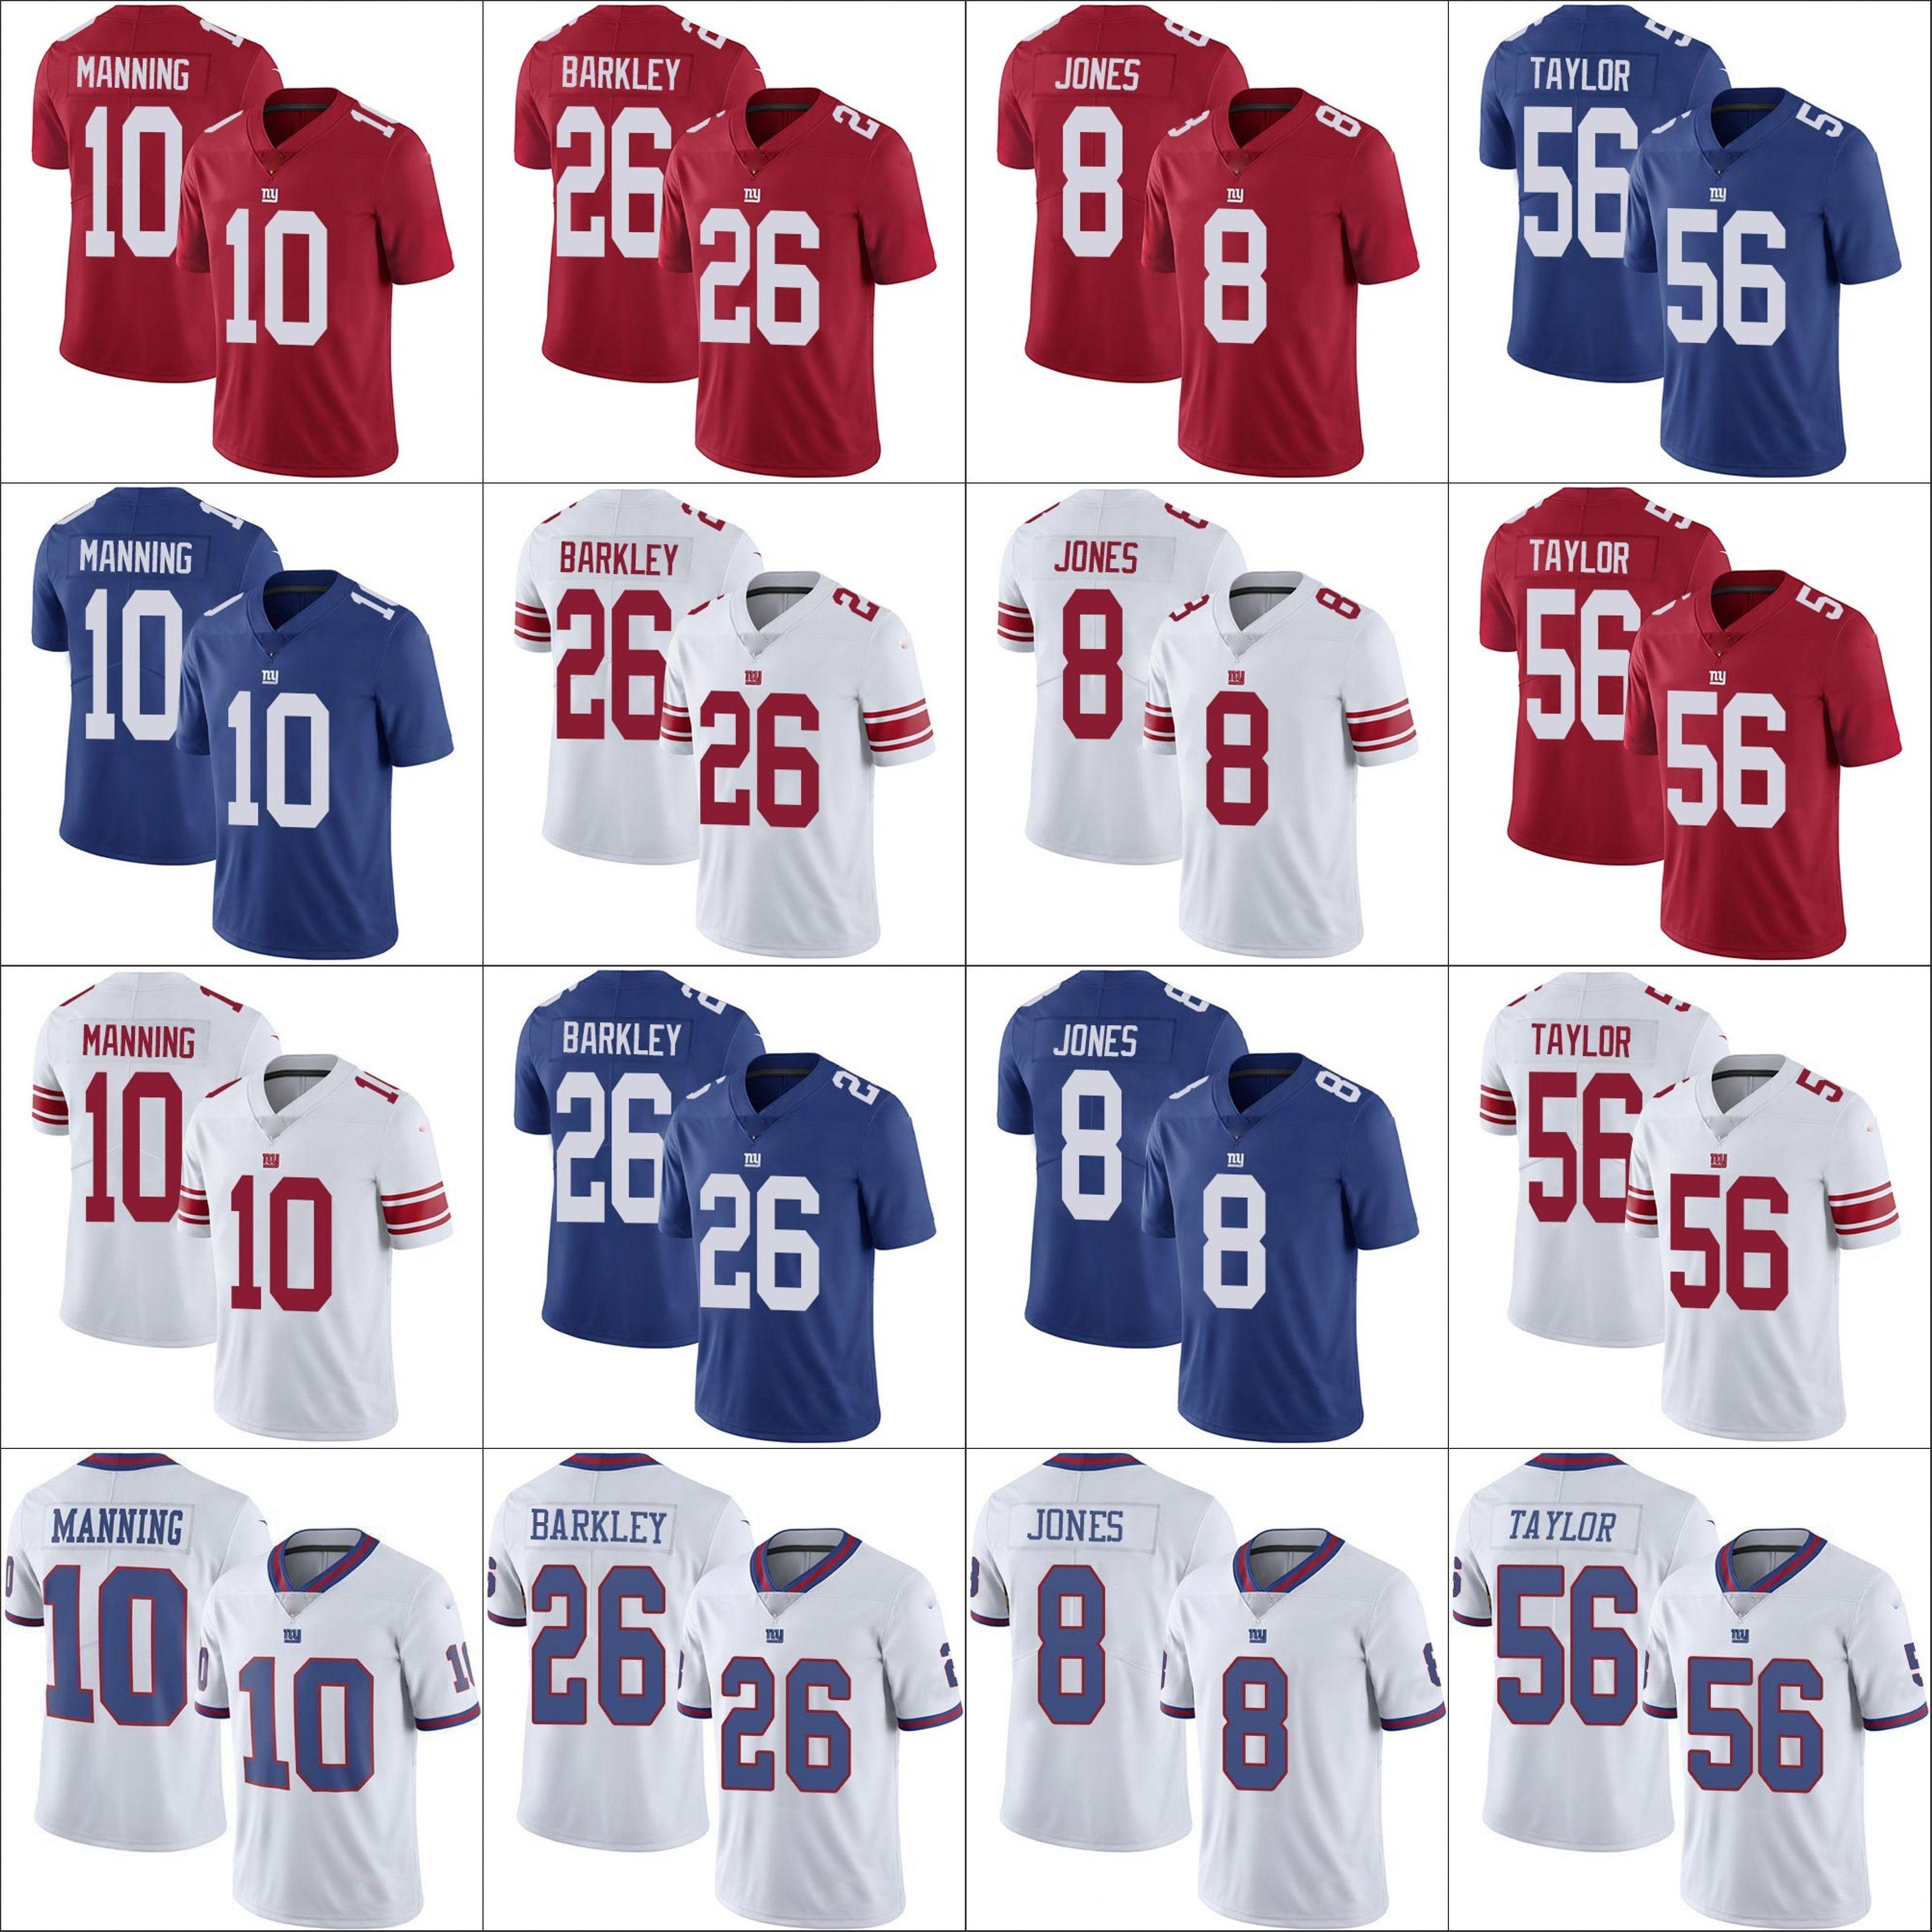 Nova yorkGiantsMen # 10 Eli Manning 26 Saquon Barkley 8 Daniel Jones 56 Lawrence Taylor Mulheres JovensNFL Football Jersey